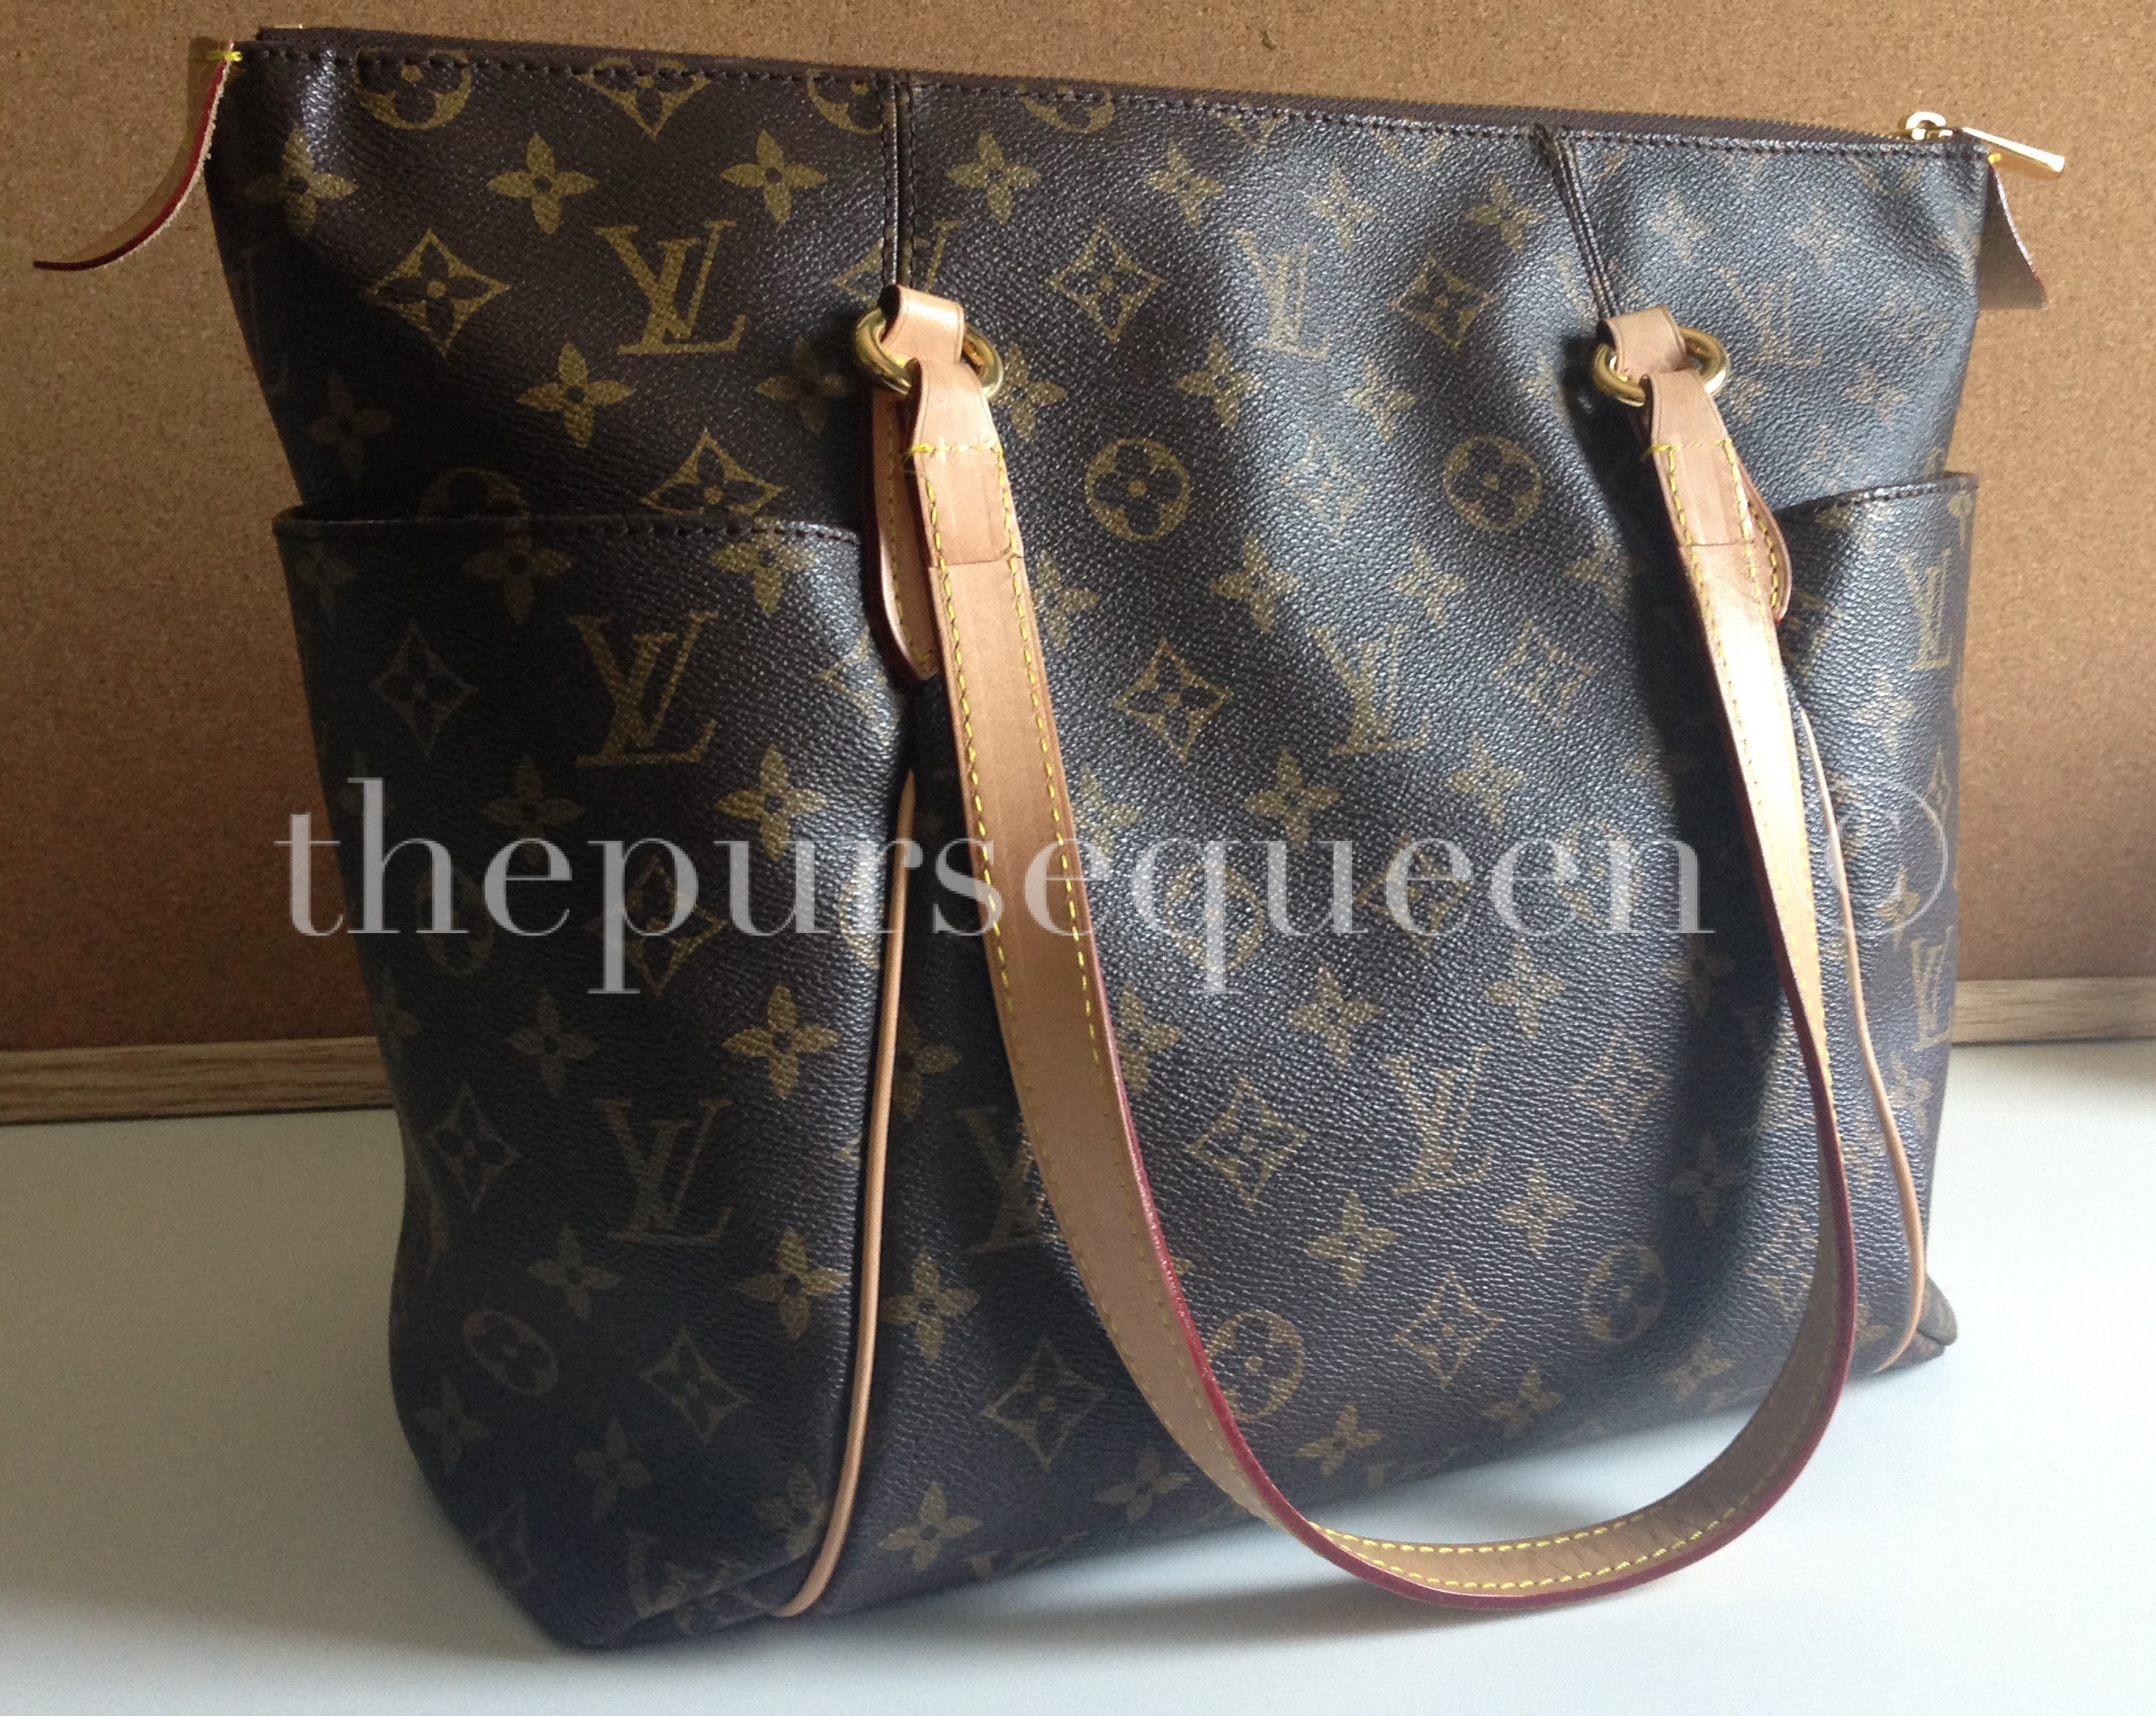 4842c505c47 Authenic vs Replica Louis Vuitton Purchasing Guide - Authentic ...